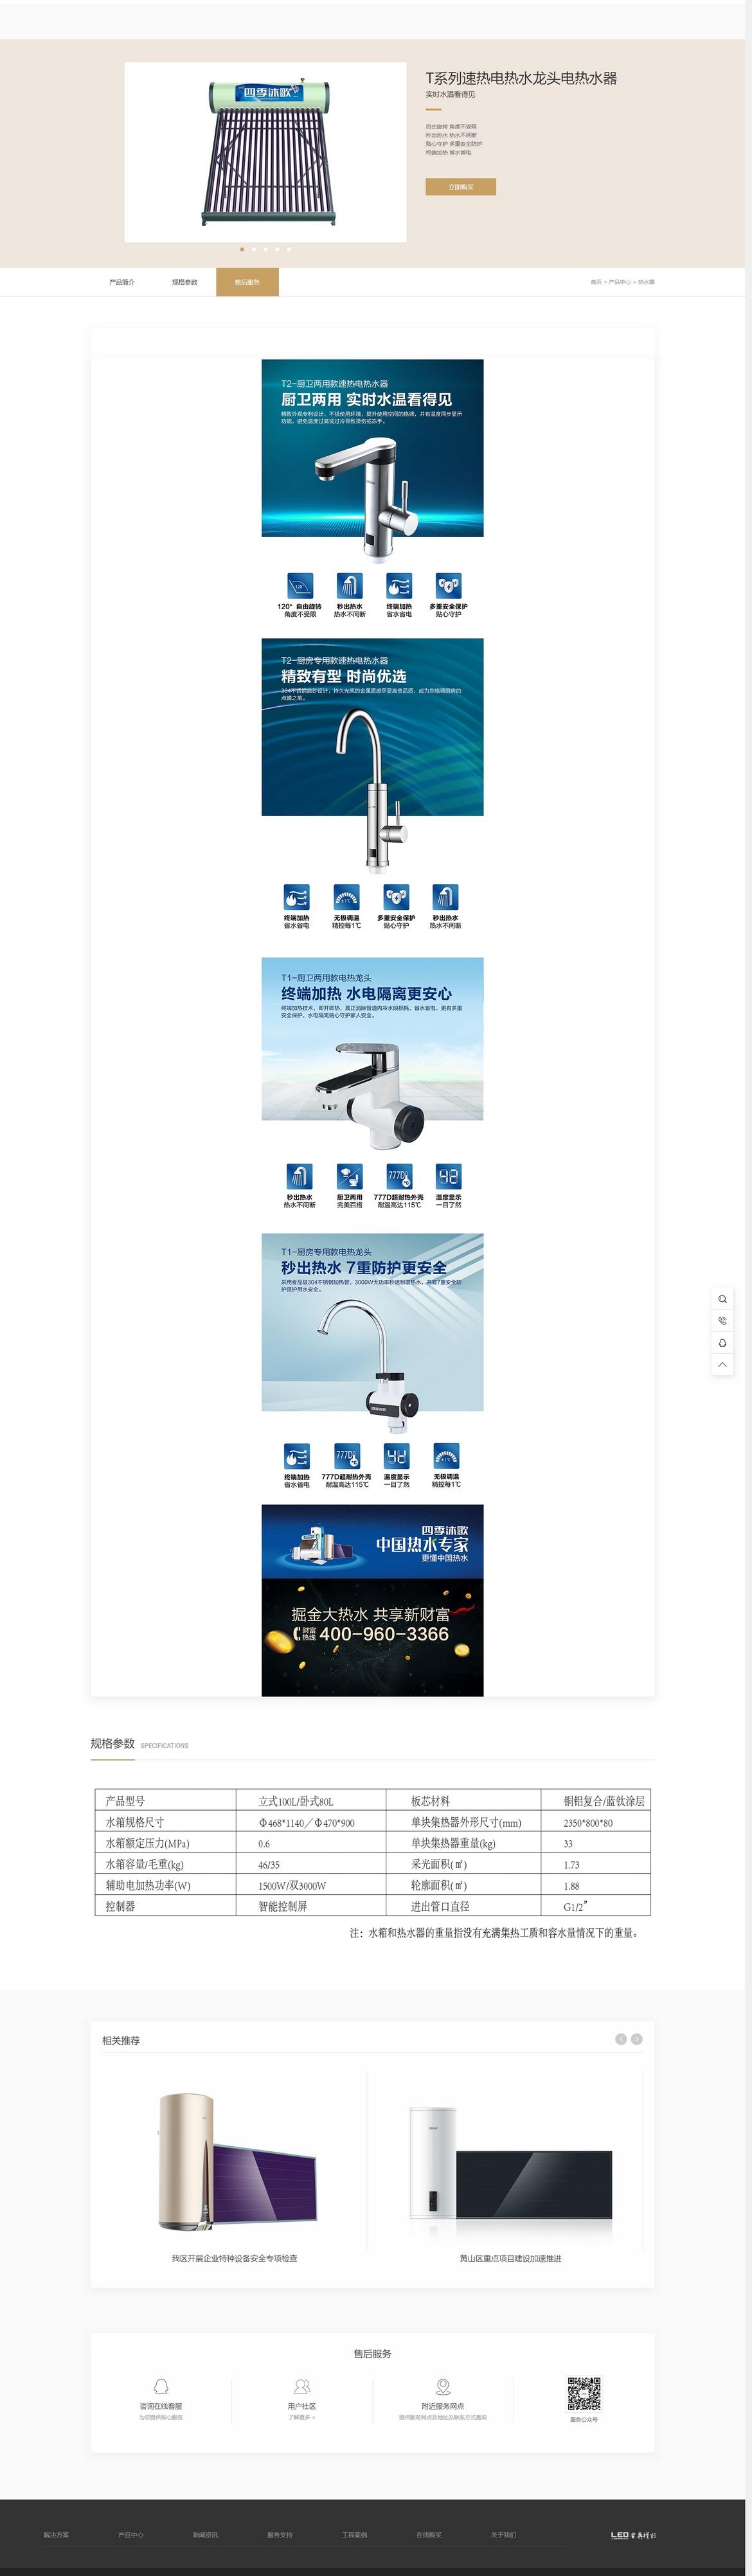 nEO_IMG_产品内容页